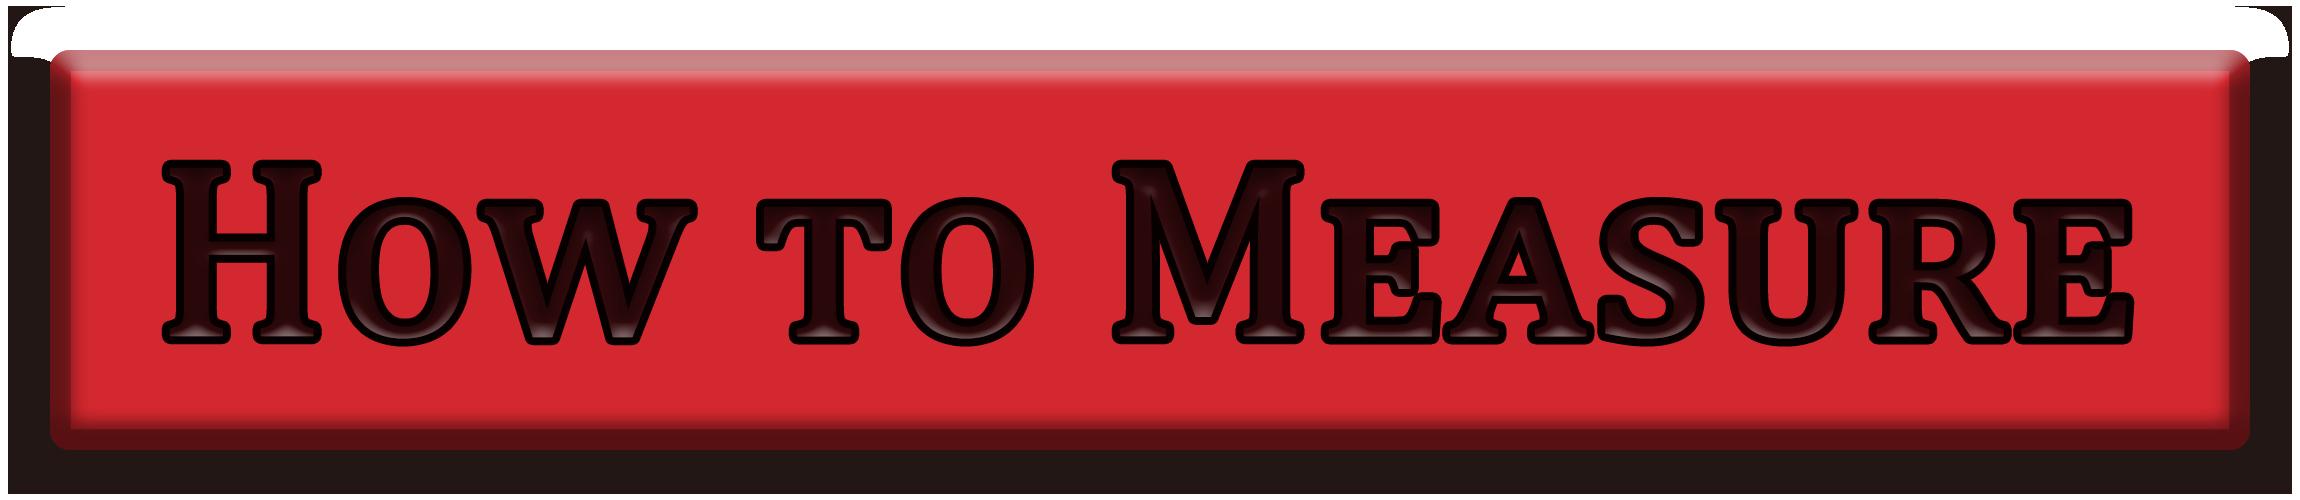 measure-button.png